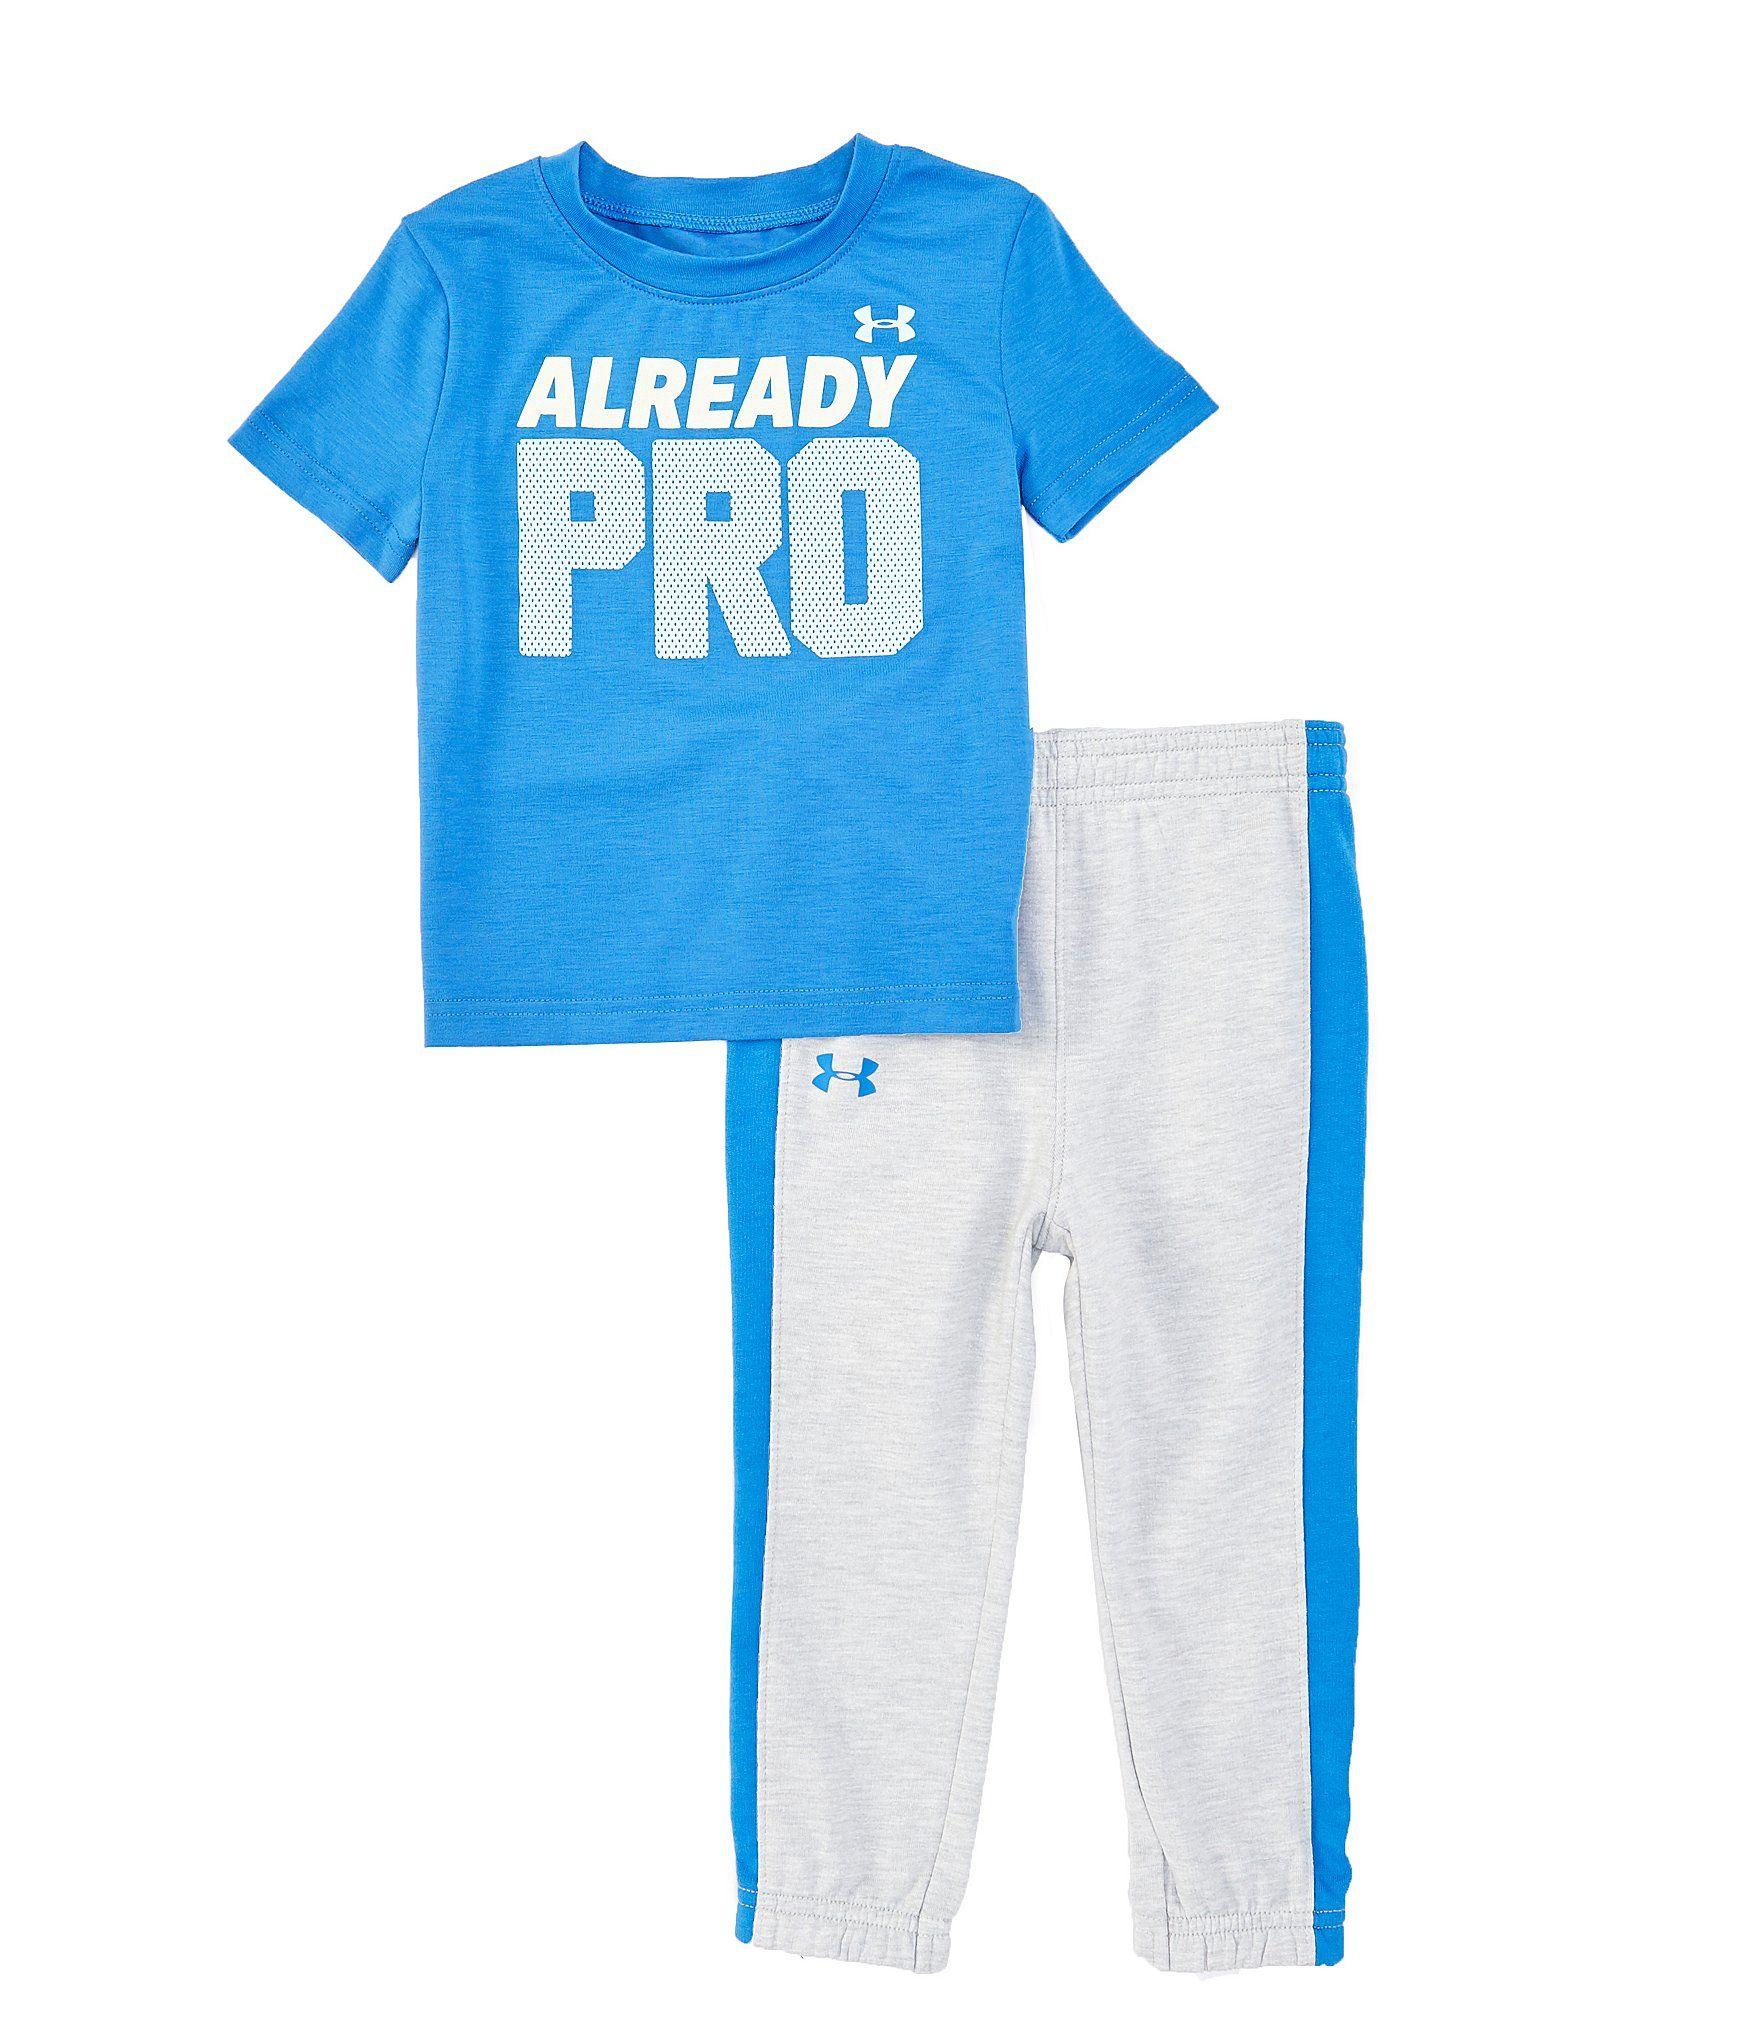 Under Armour Boys Short Sleeve Tee and Pant Set